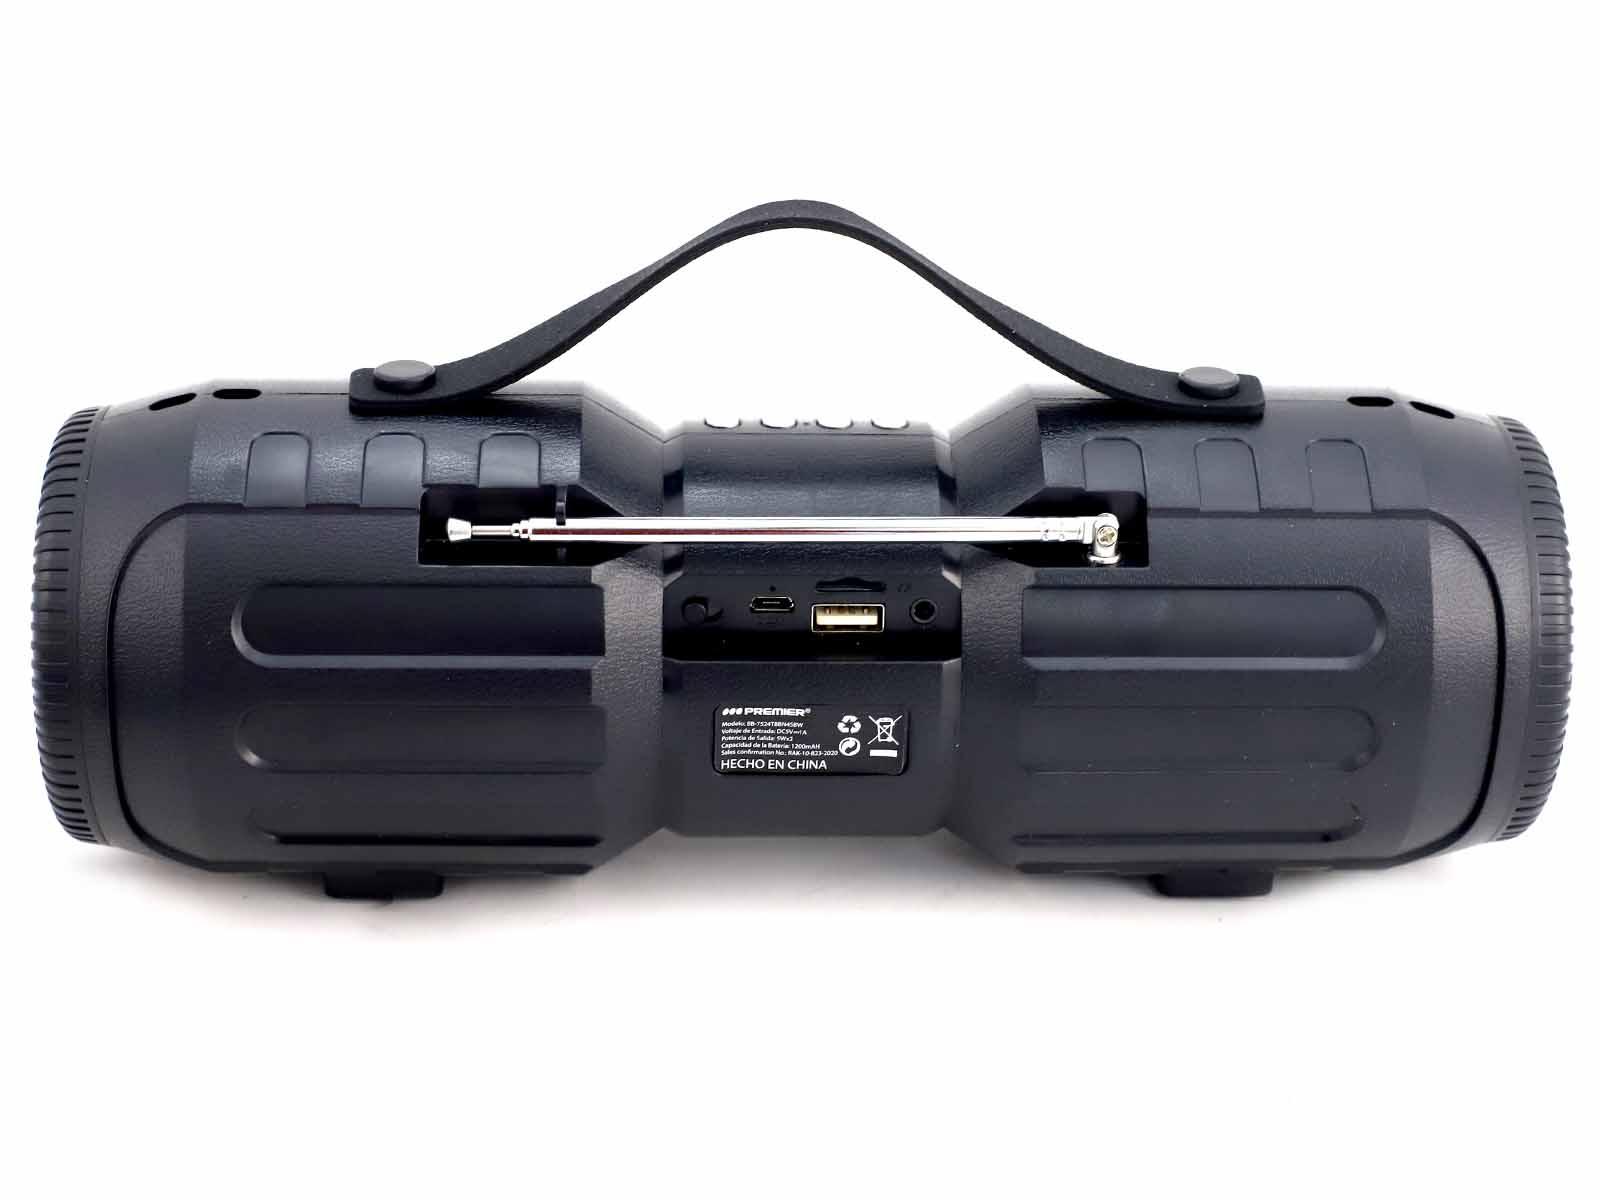 Imagen de producto Parlante portatil multimedia con bateria recargable 8